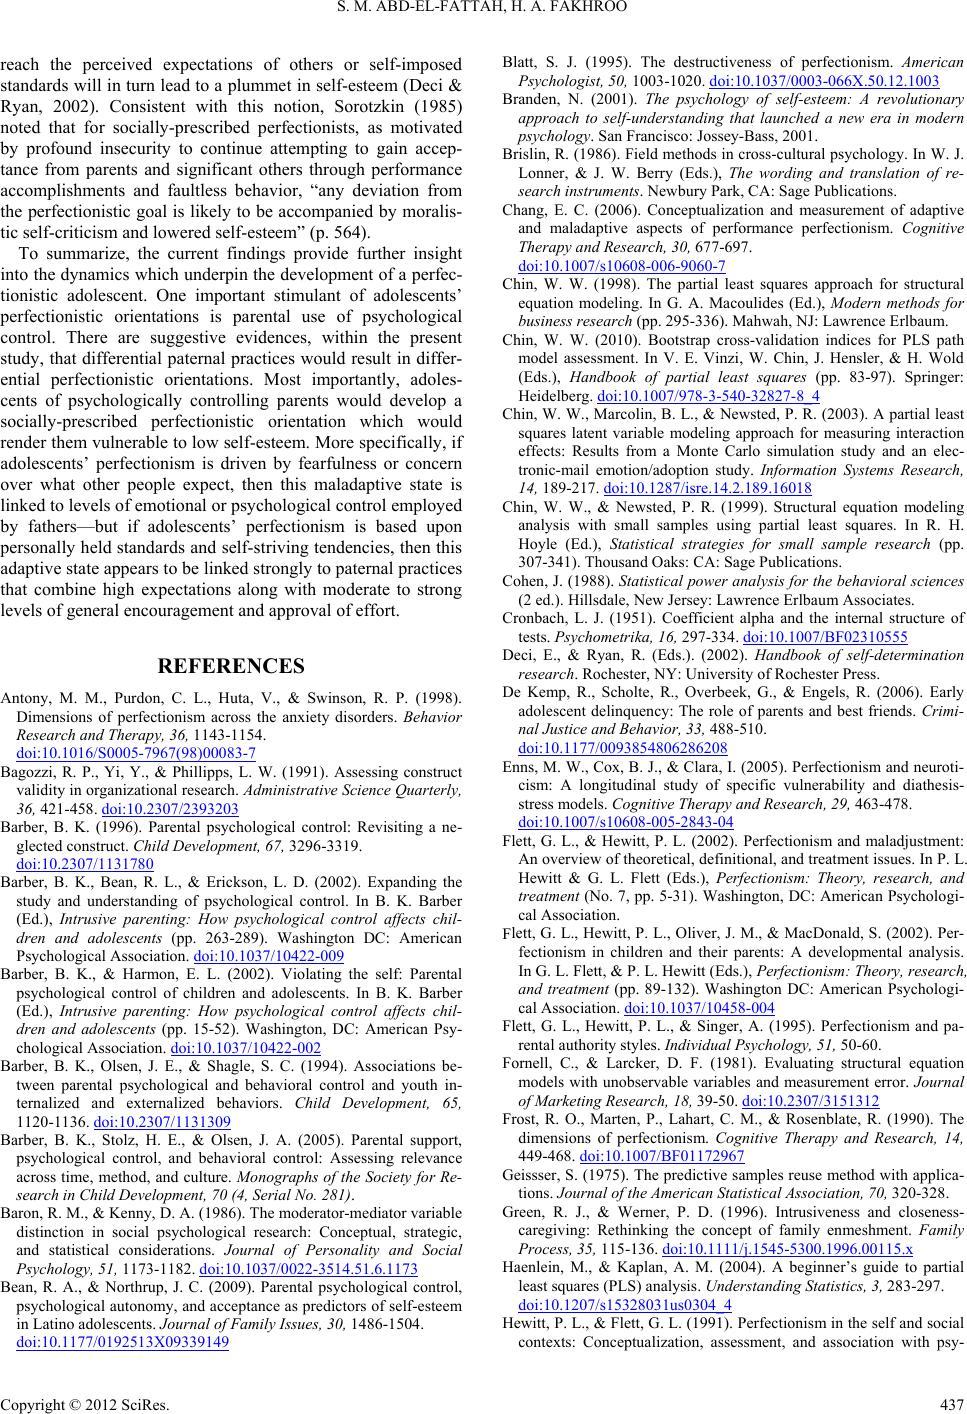 self determination theory deci and ryan 1985 pdf